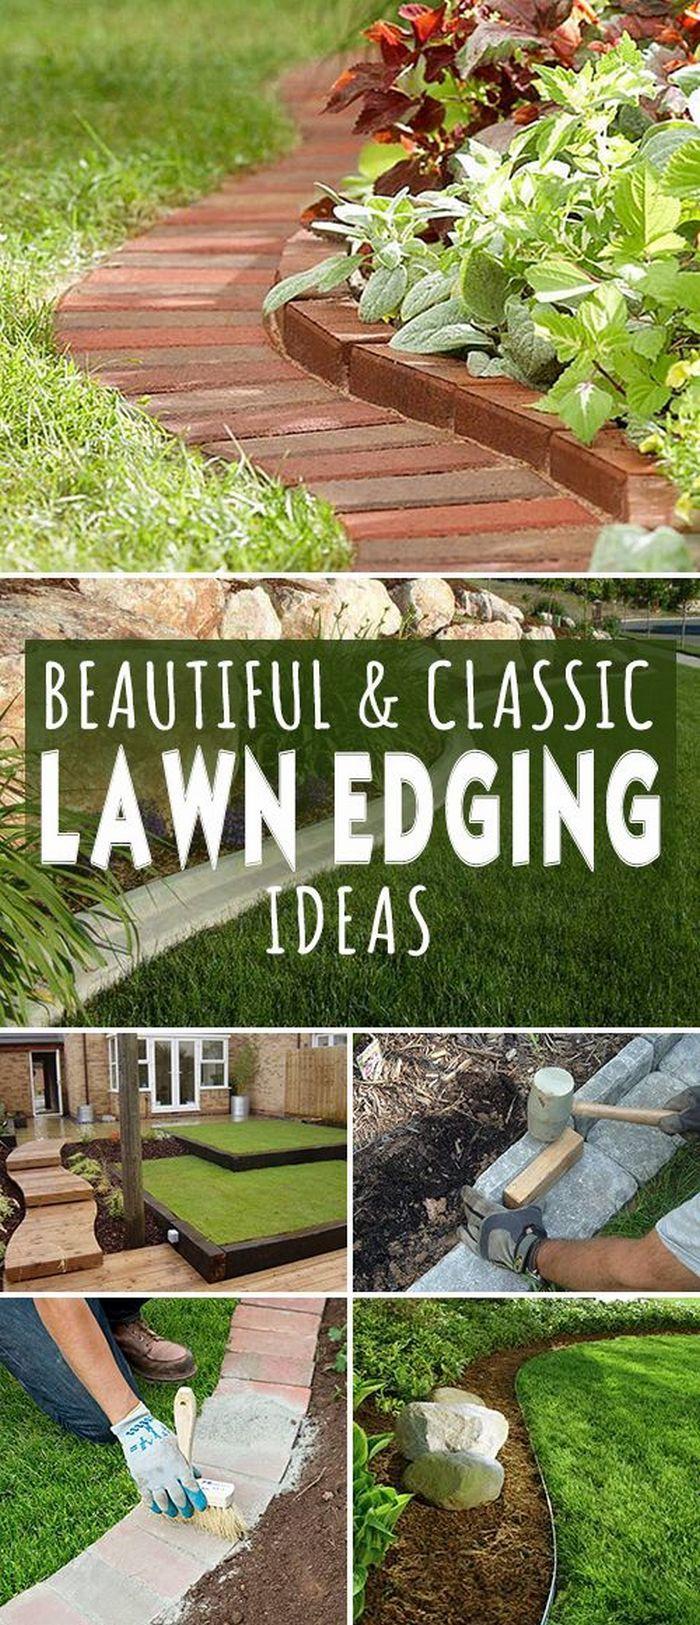 Ten Interesting Garden Bed Edging Ideas